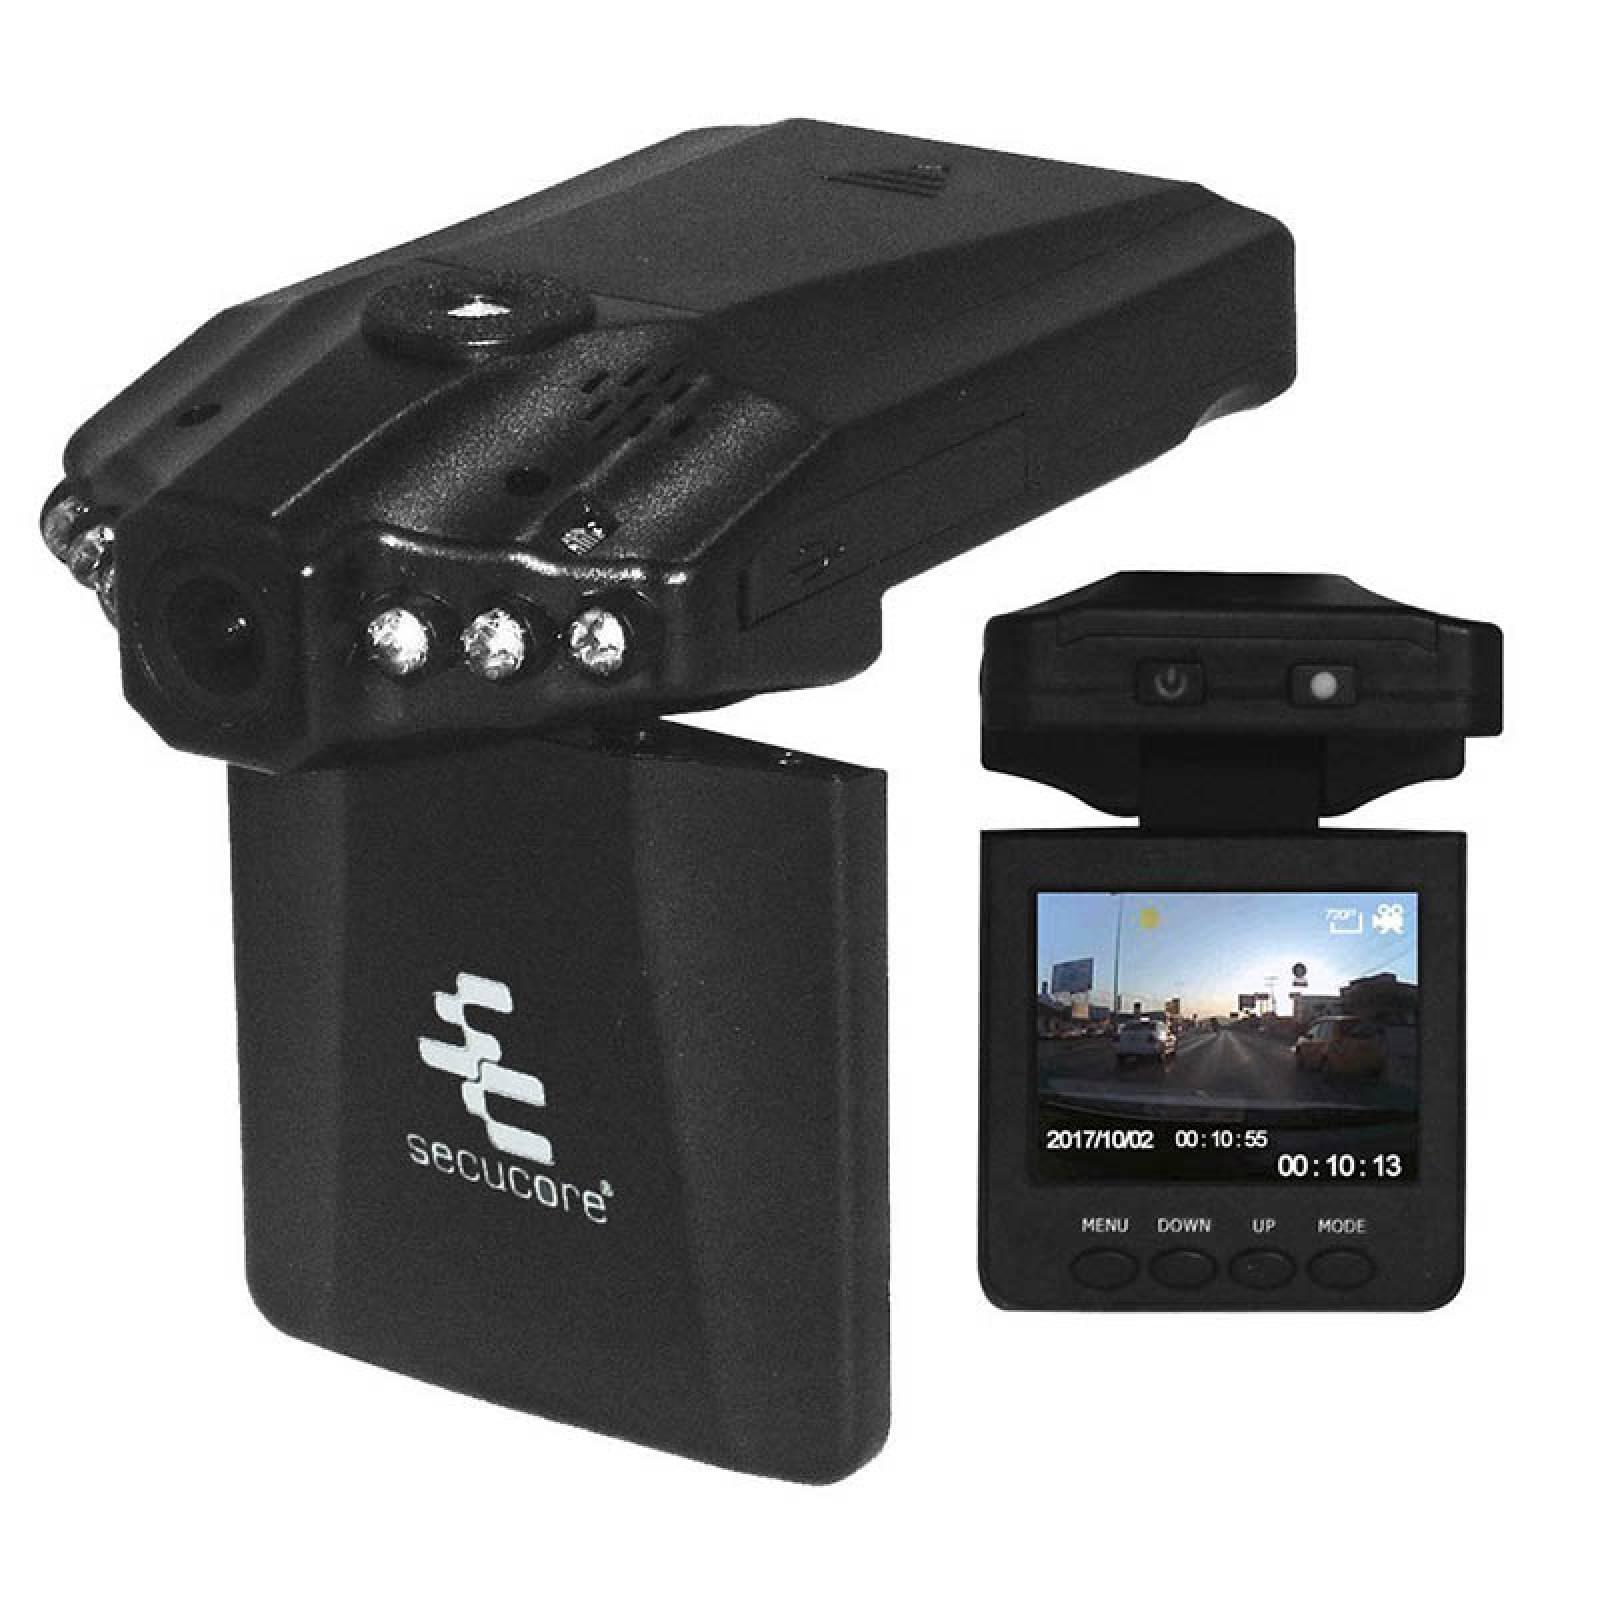 Mini Grabador Dvr Para Vehiculos Con Camara Pantalla Bateria